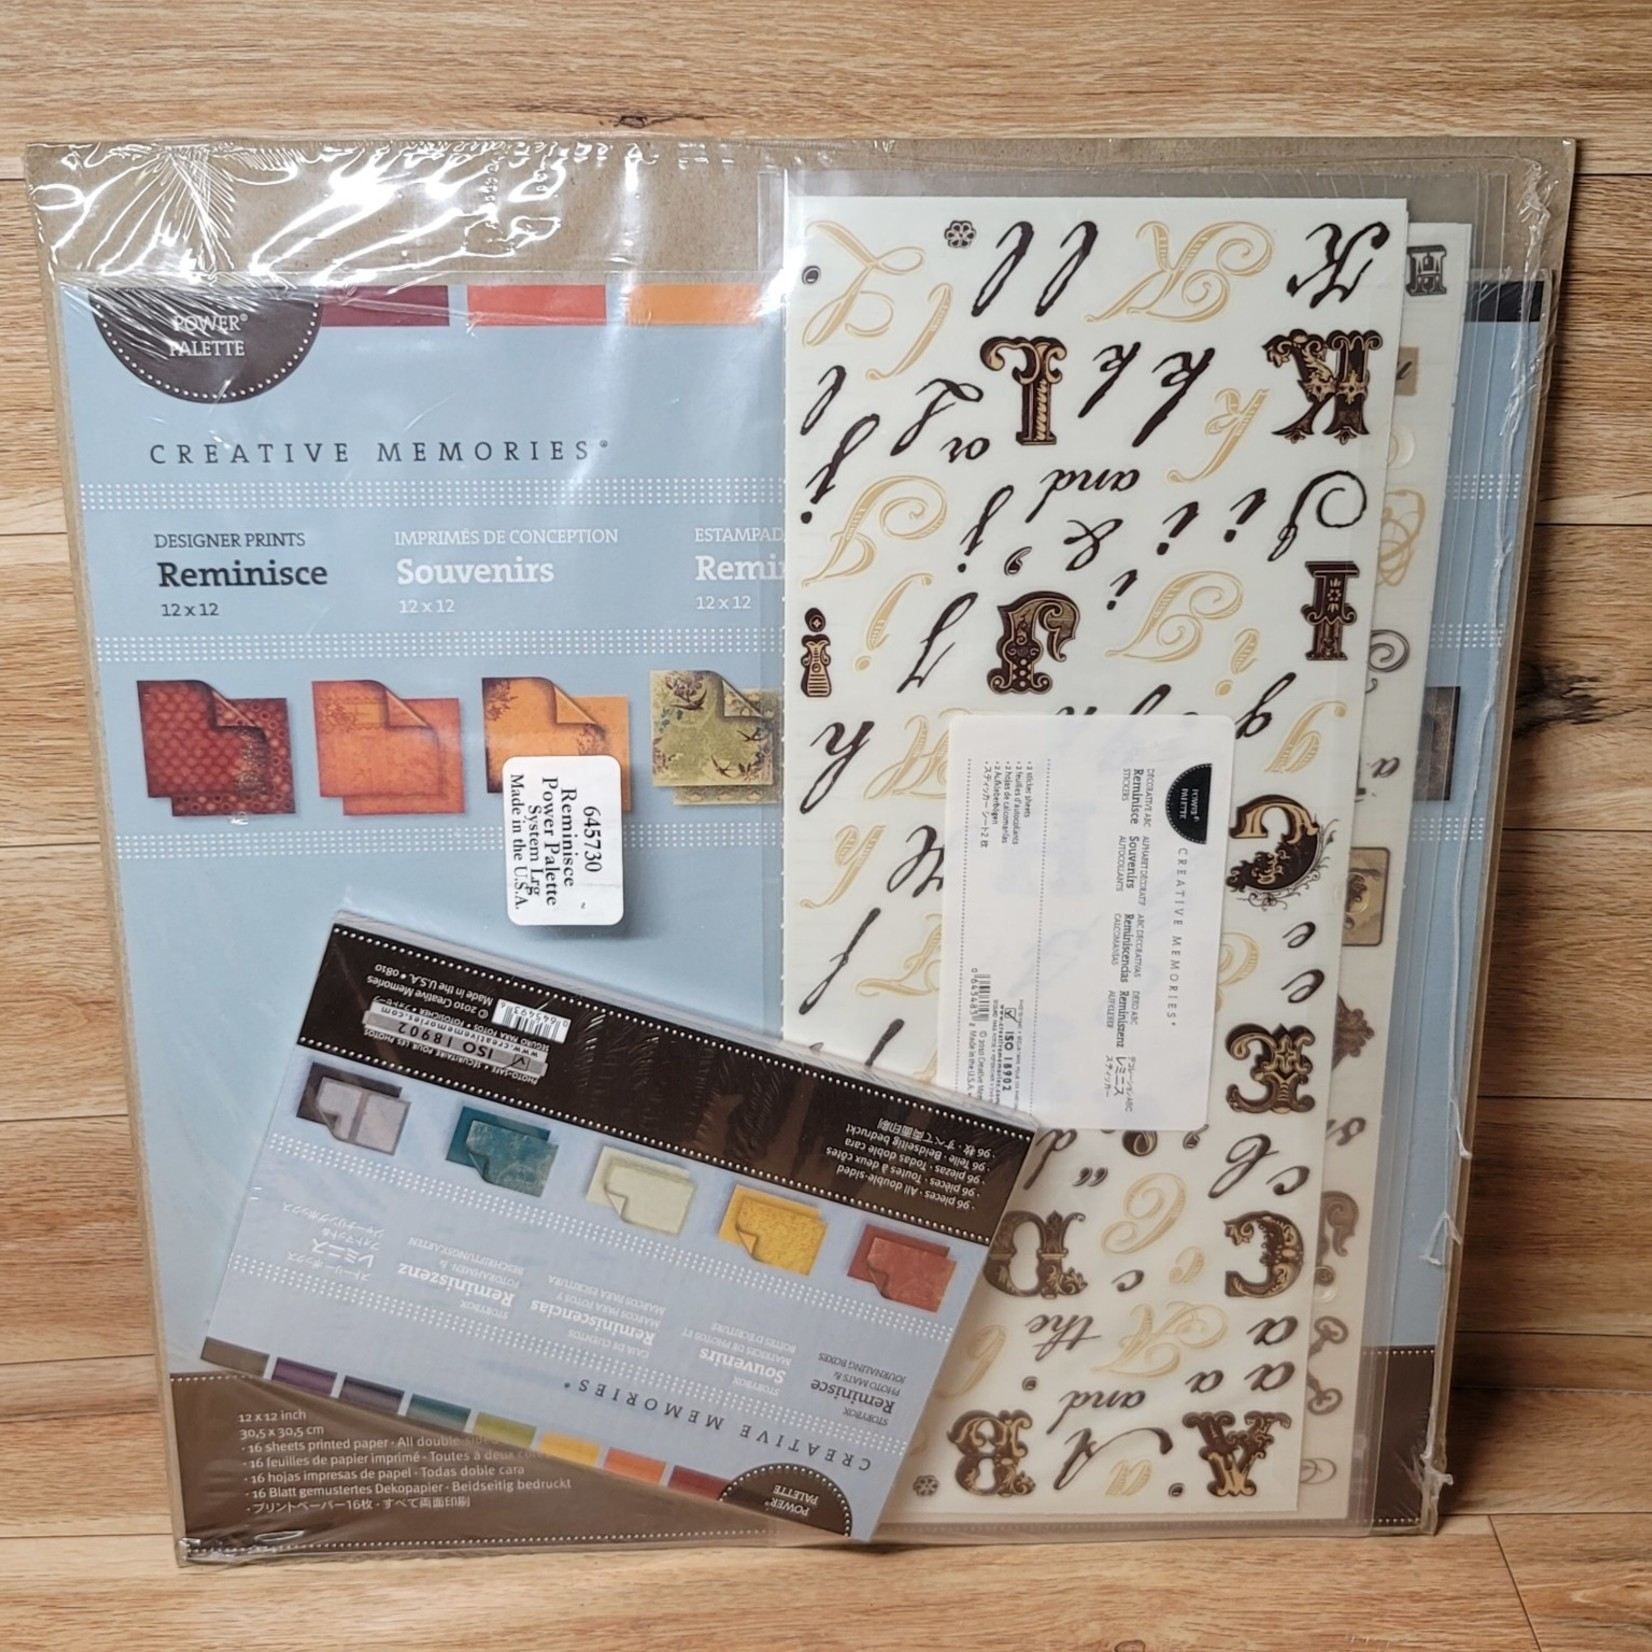 Creative Memories - Designer Prints - Reminisce Full Kit